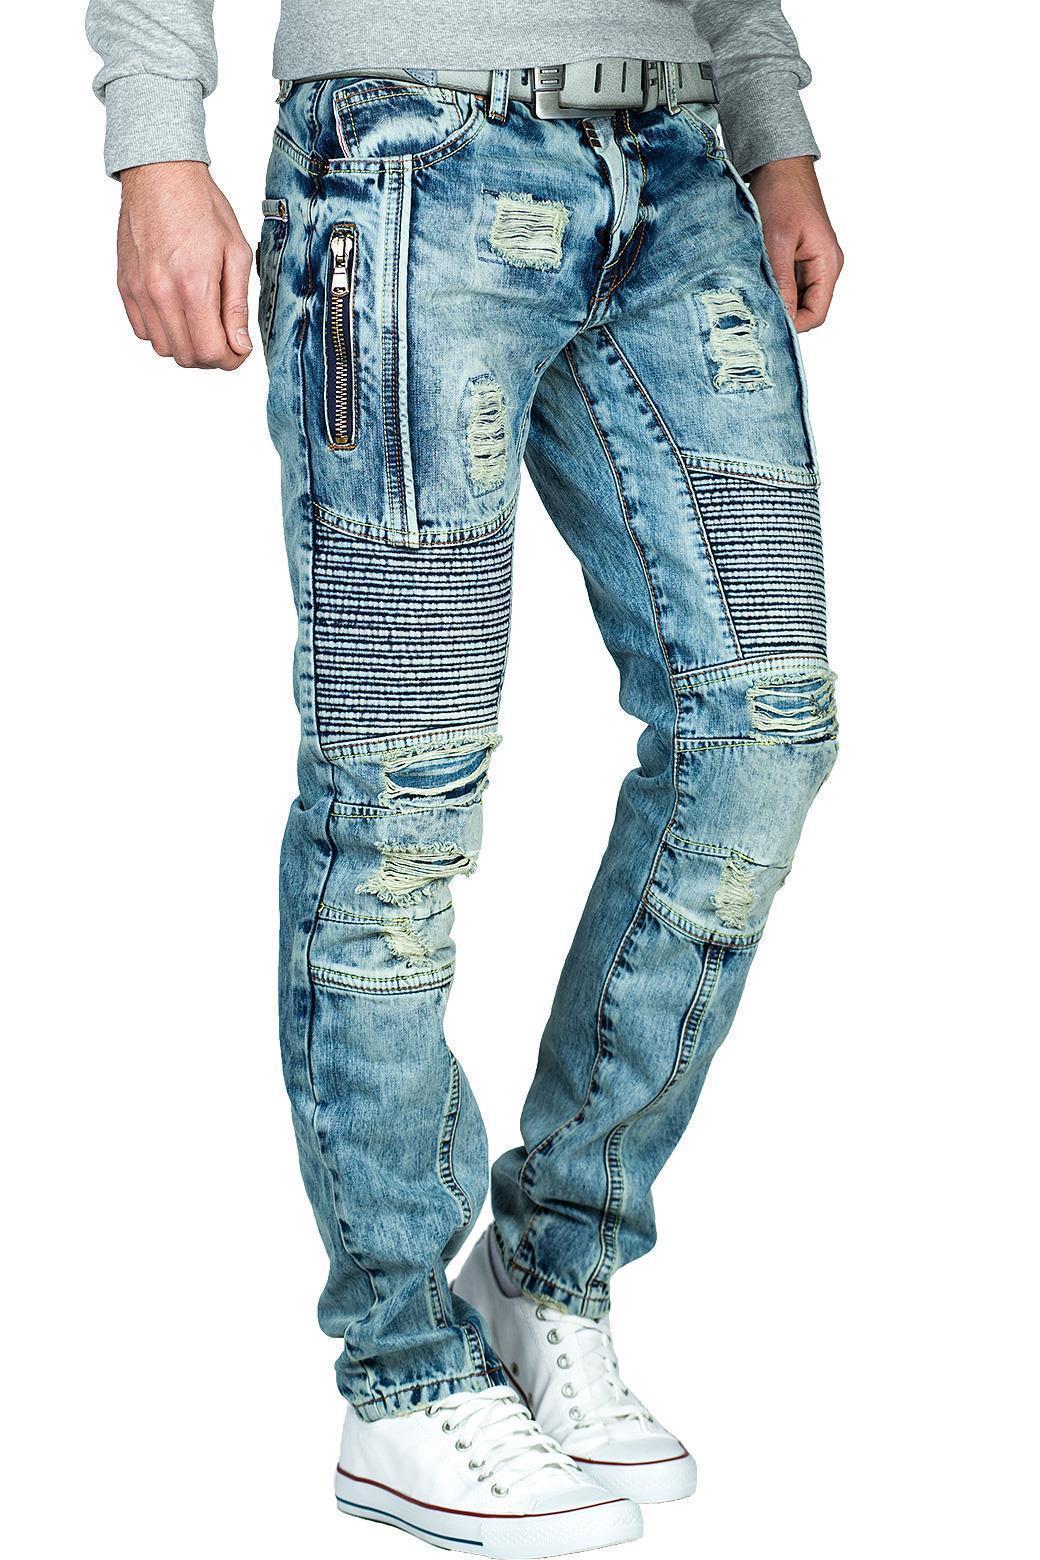 Cipo-amp-Baxx-Uomo-Jeans-Pantaloni-ricamate-Biker-Style-streetwear-nervature-pattern-Dope miniatura 42